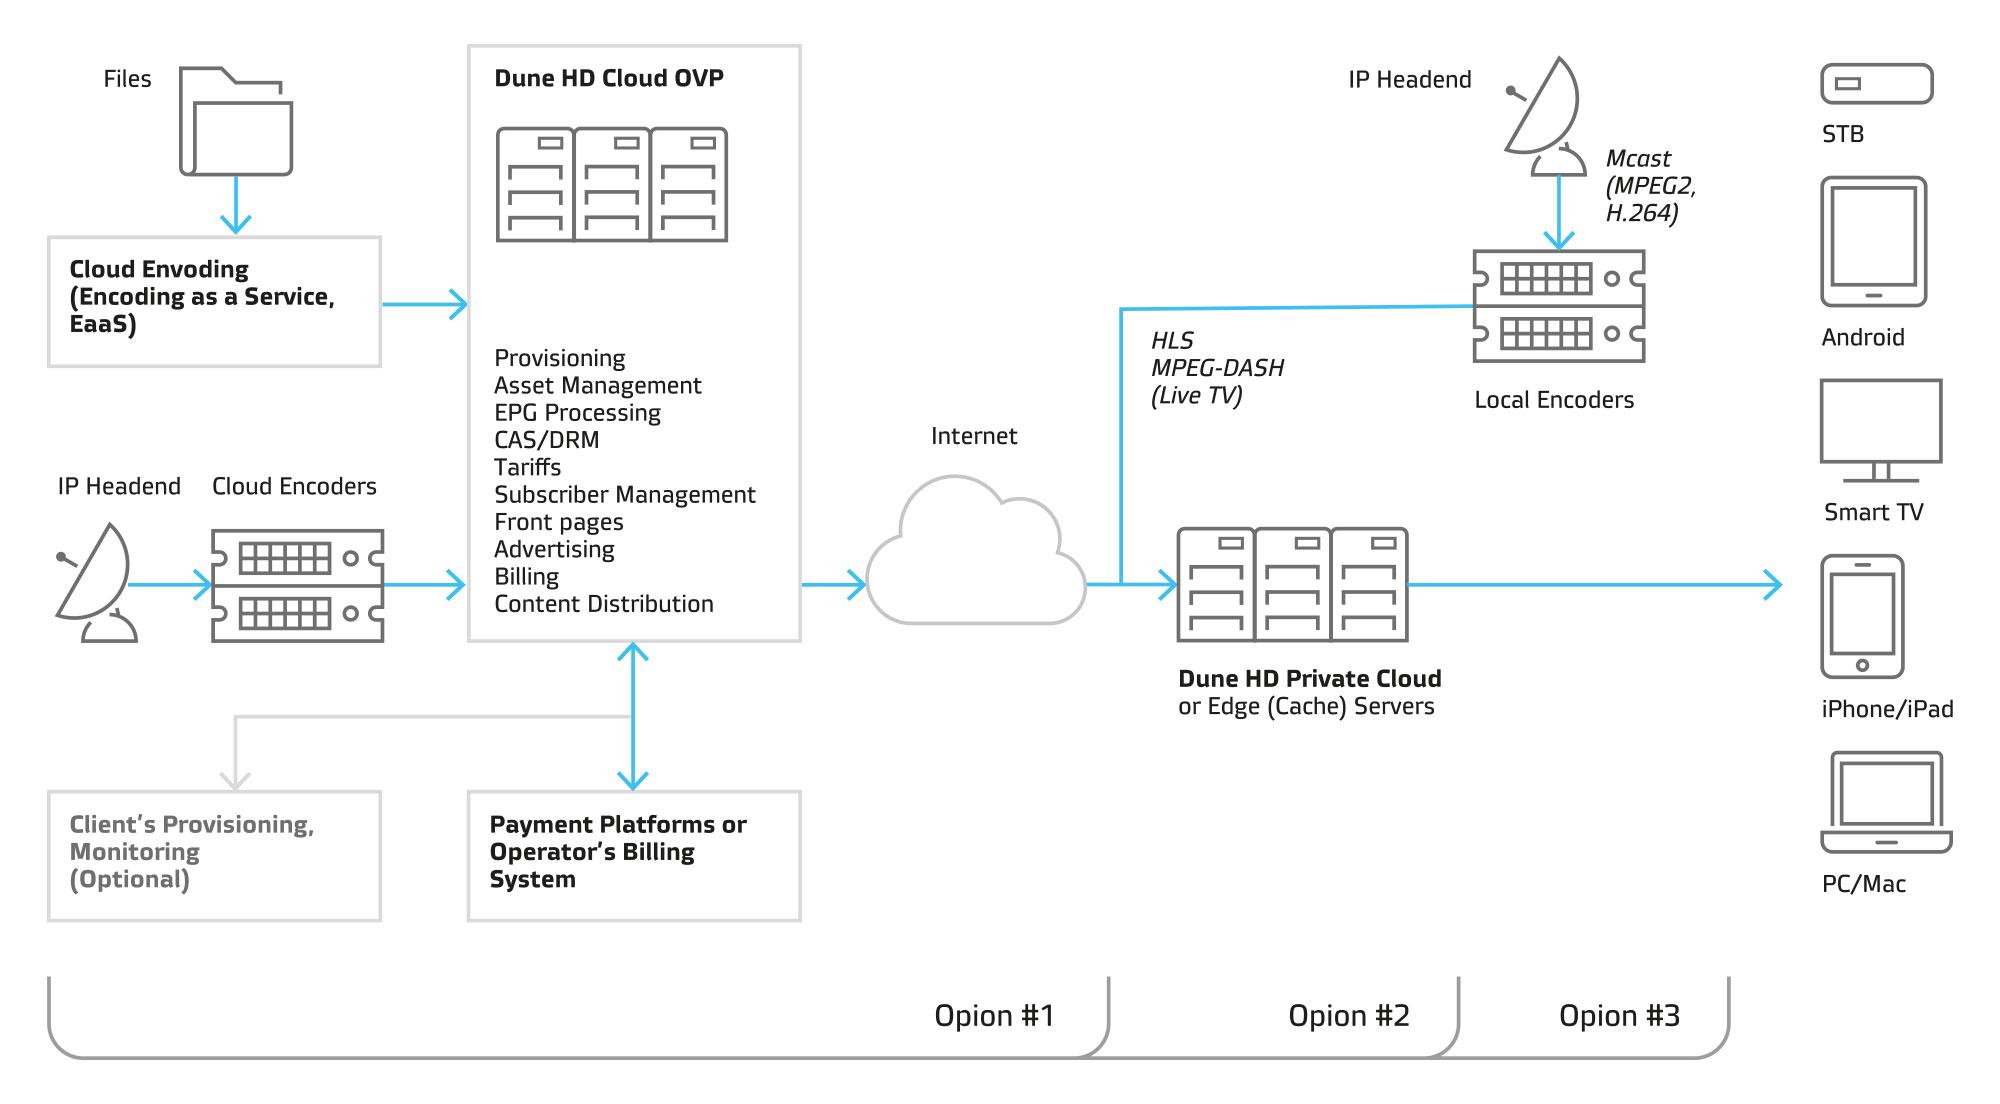 DUNE HD - Rowziązania IPTV/VOD/OTT - Dune HD Cloud